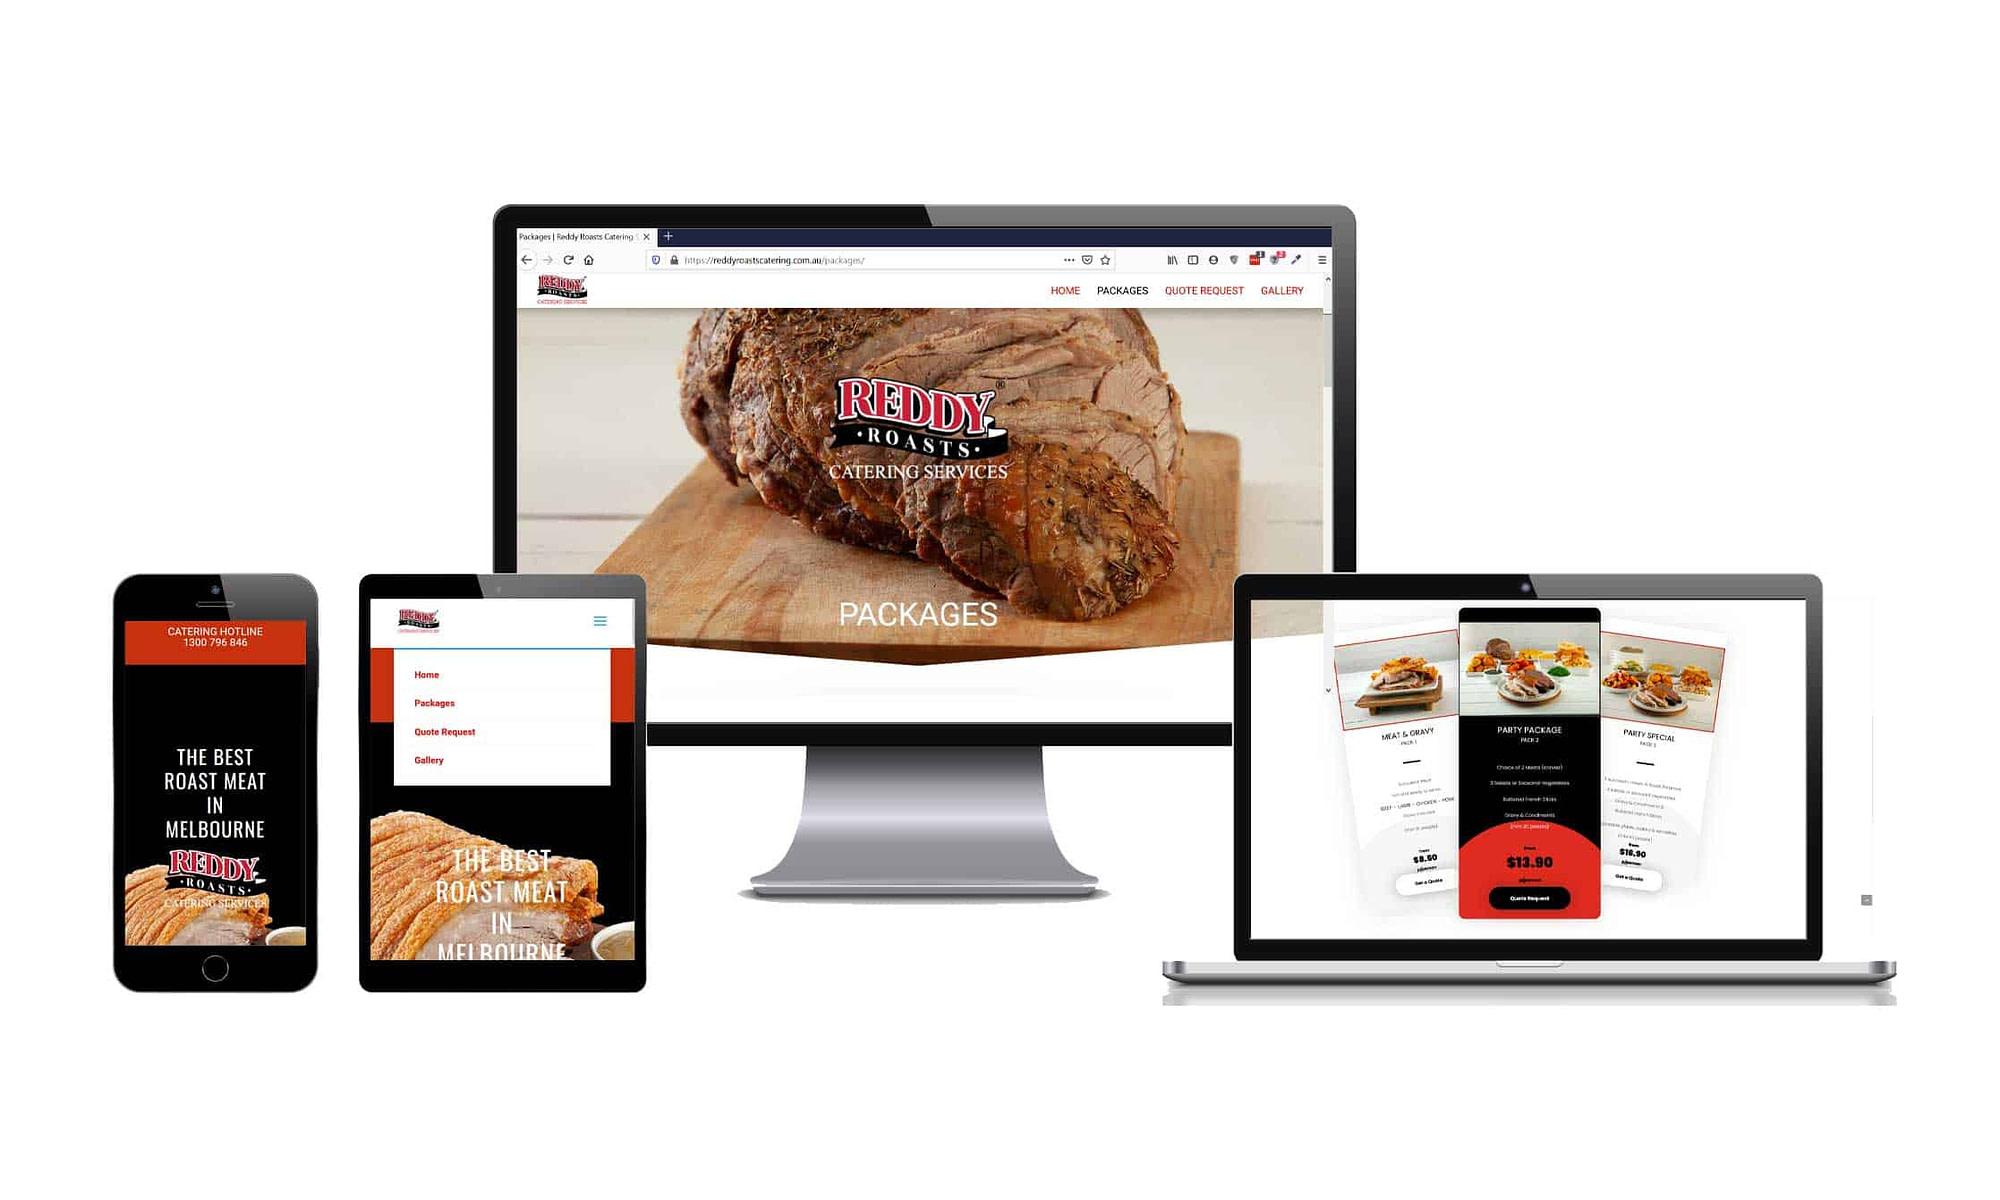 Reddy Roasts Catering Web Design